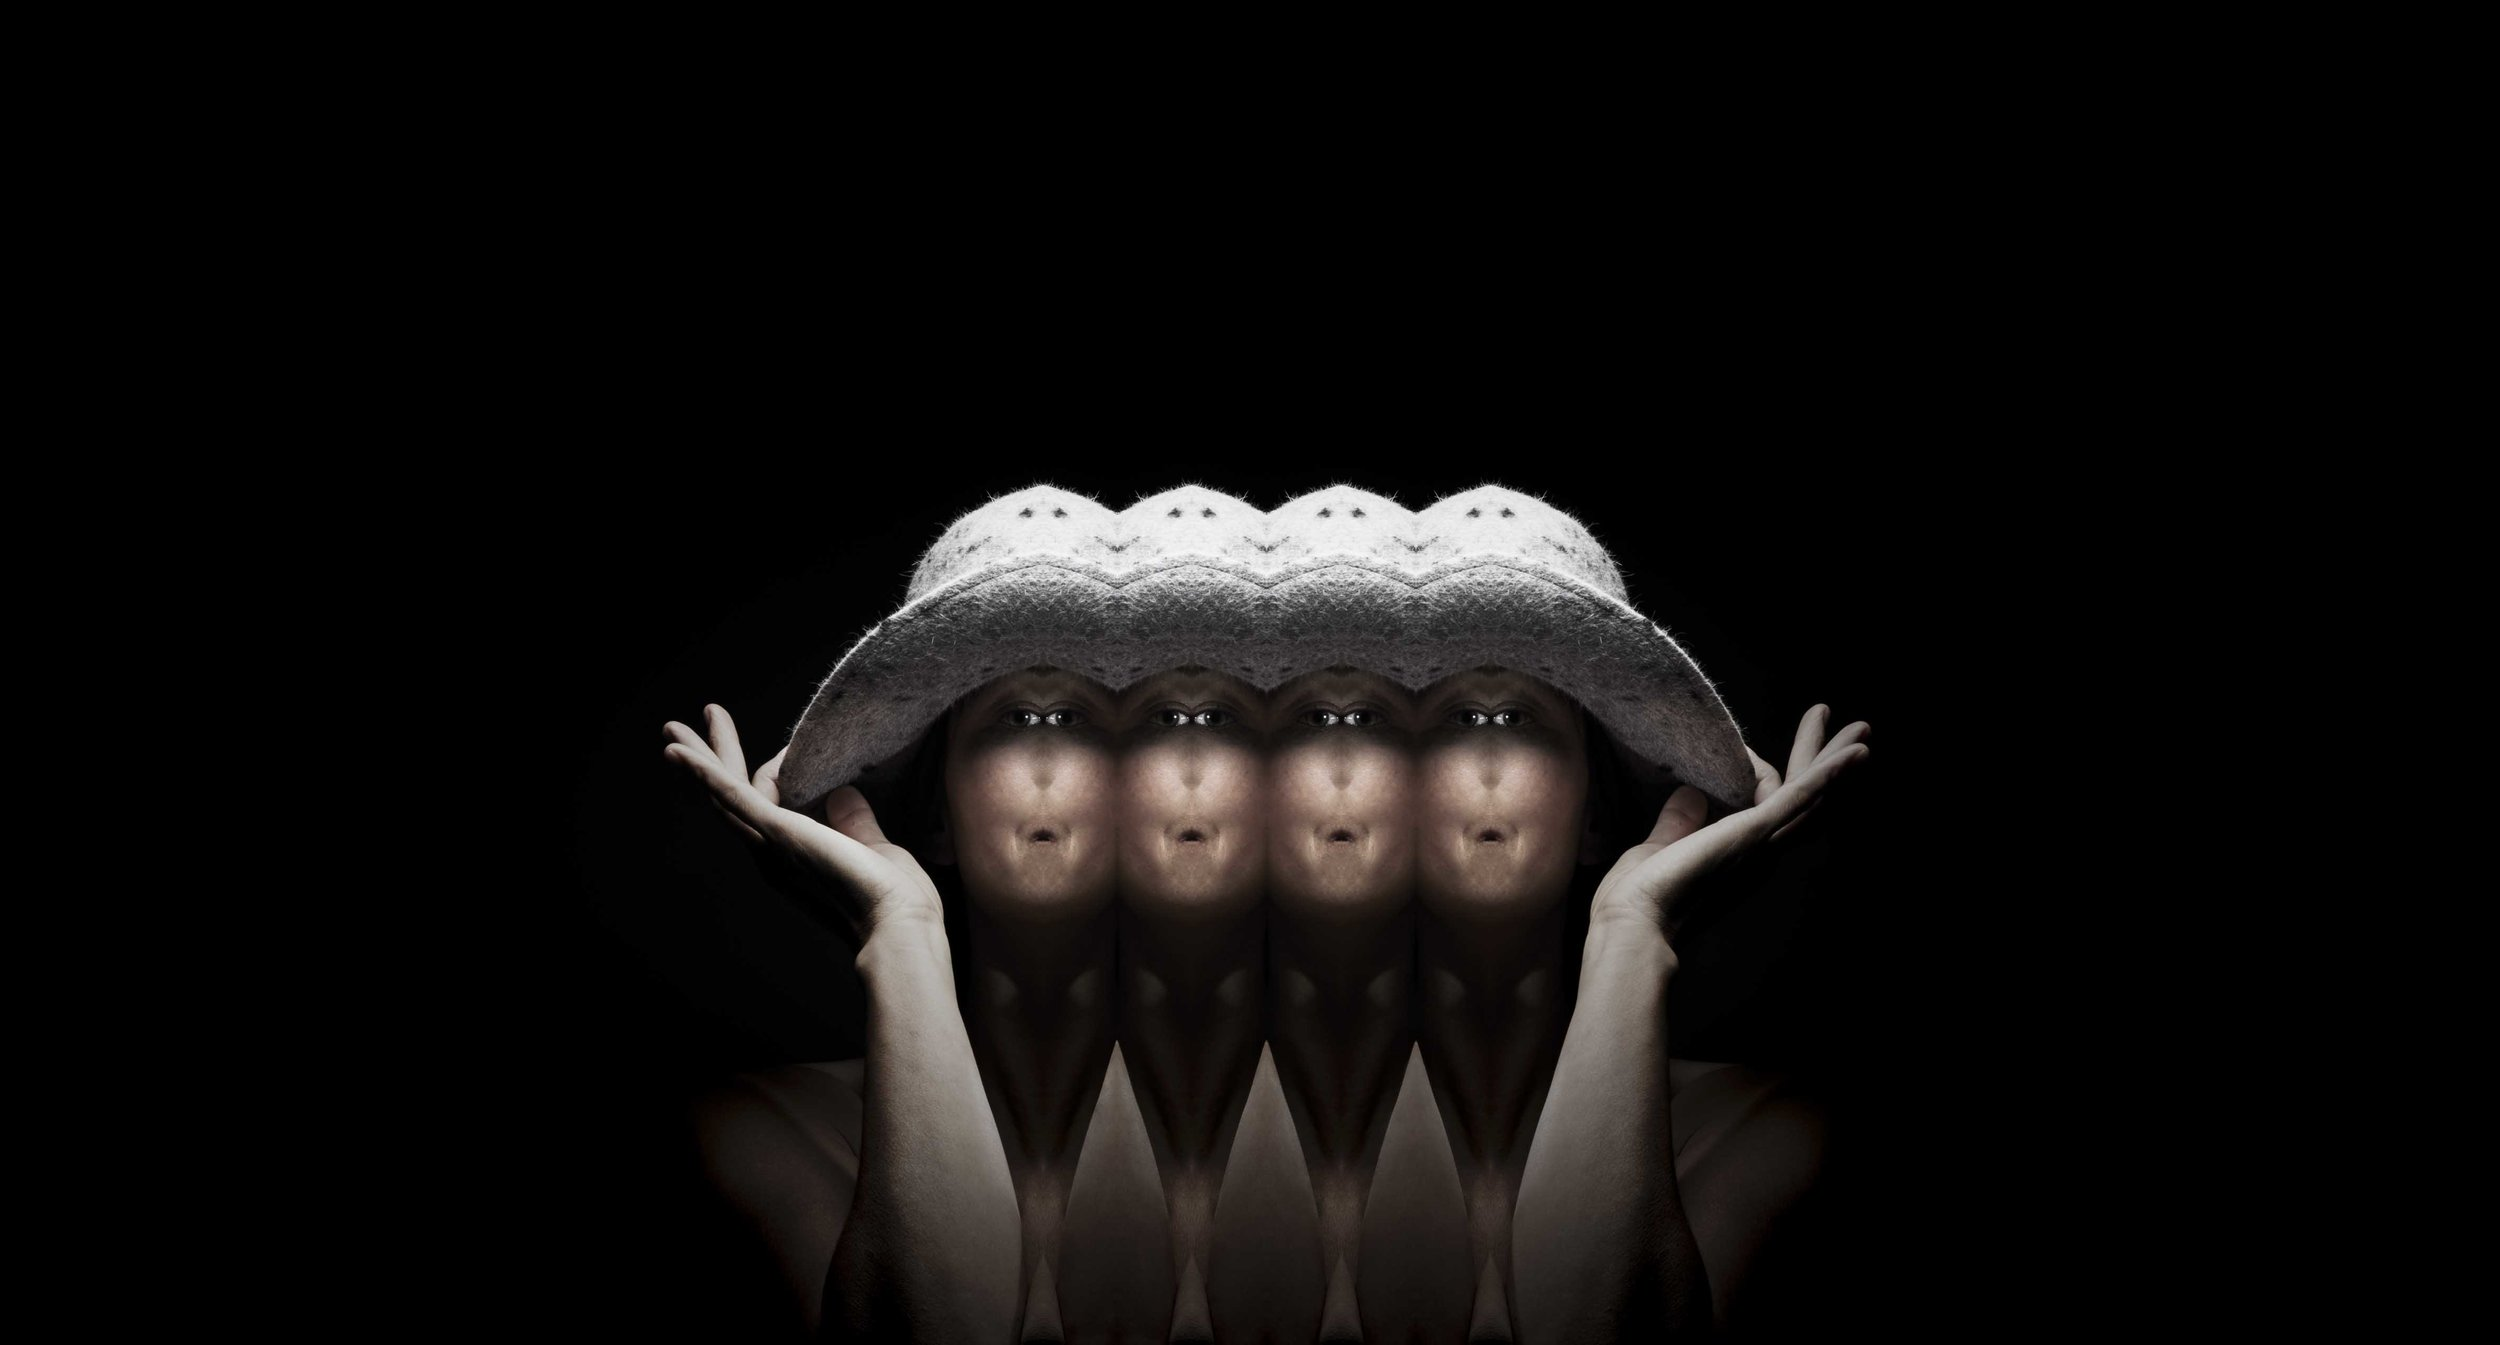 Carly hats39106done.jpg